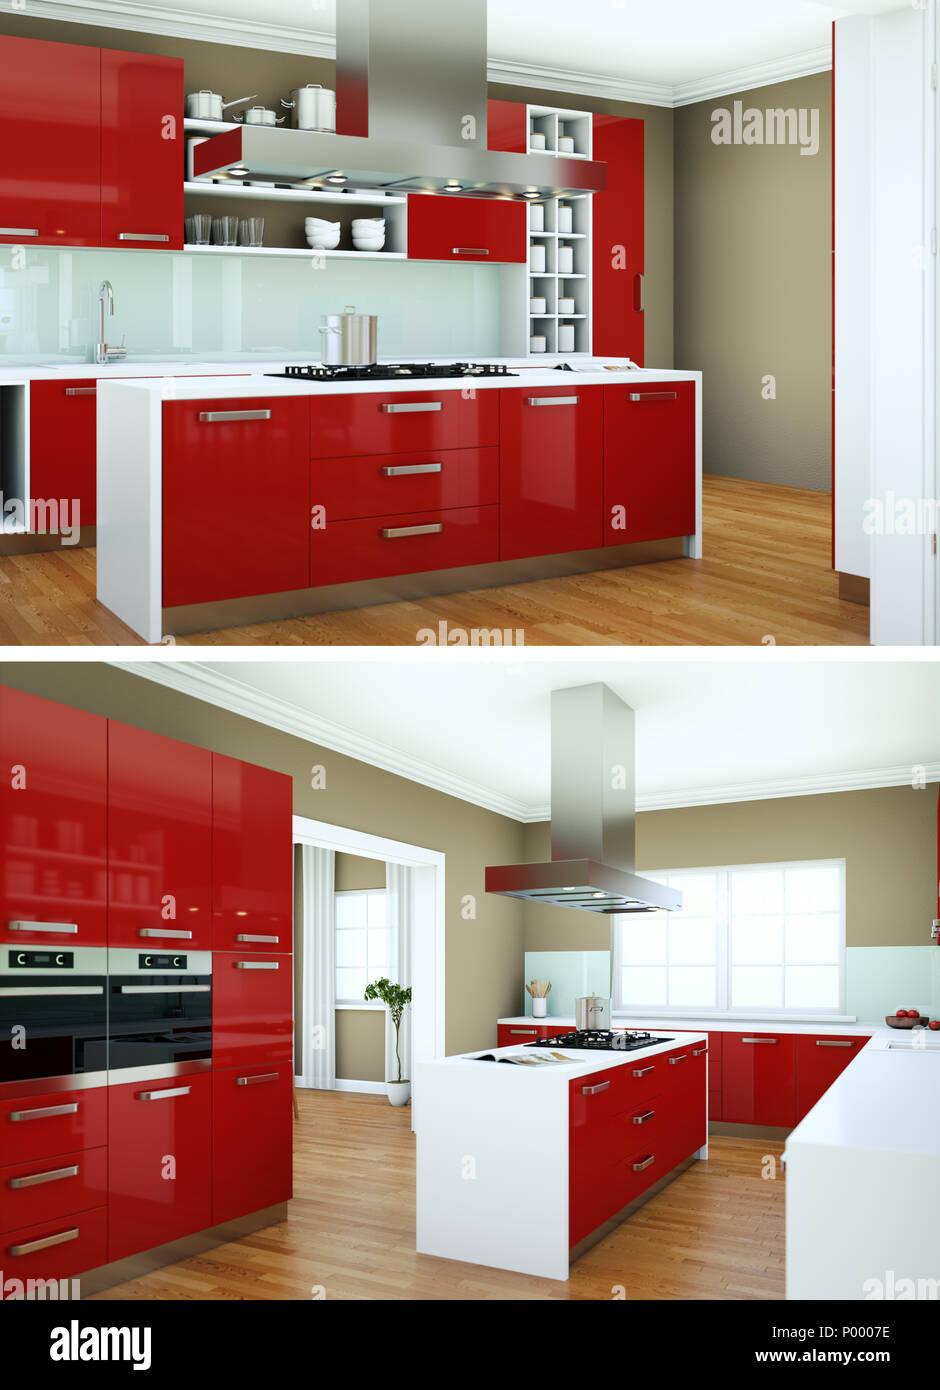 Two views of modern red kitchen Interior design Stock Photo - Alamy